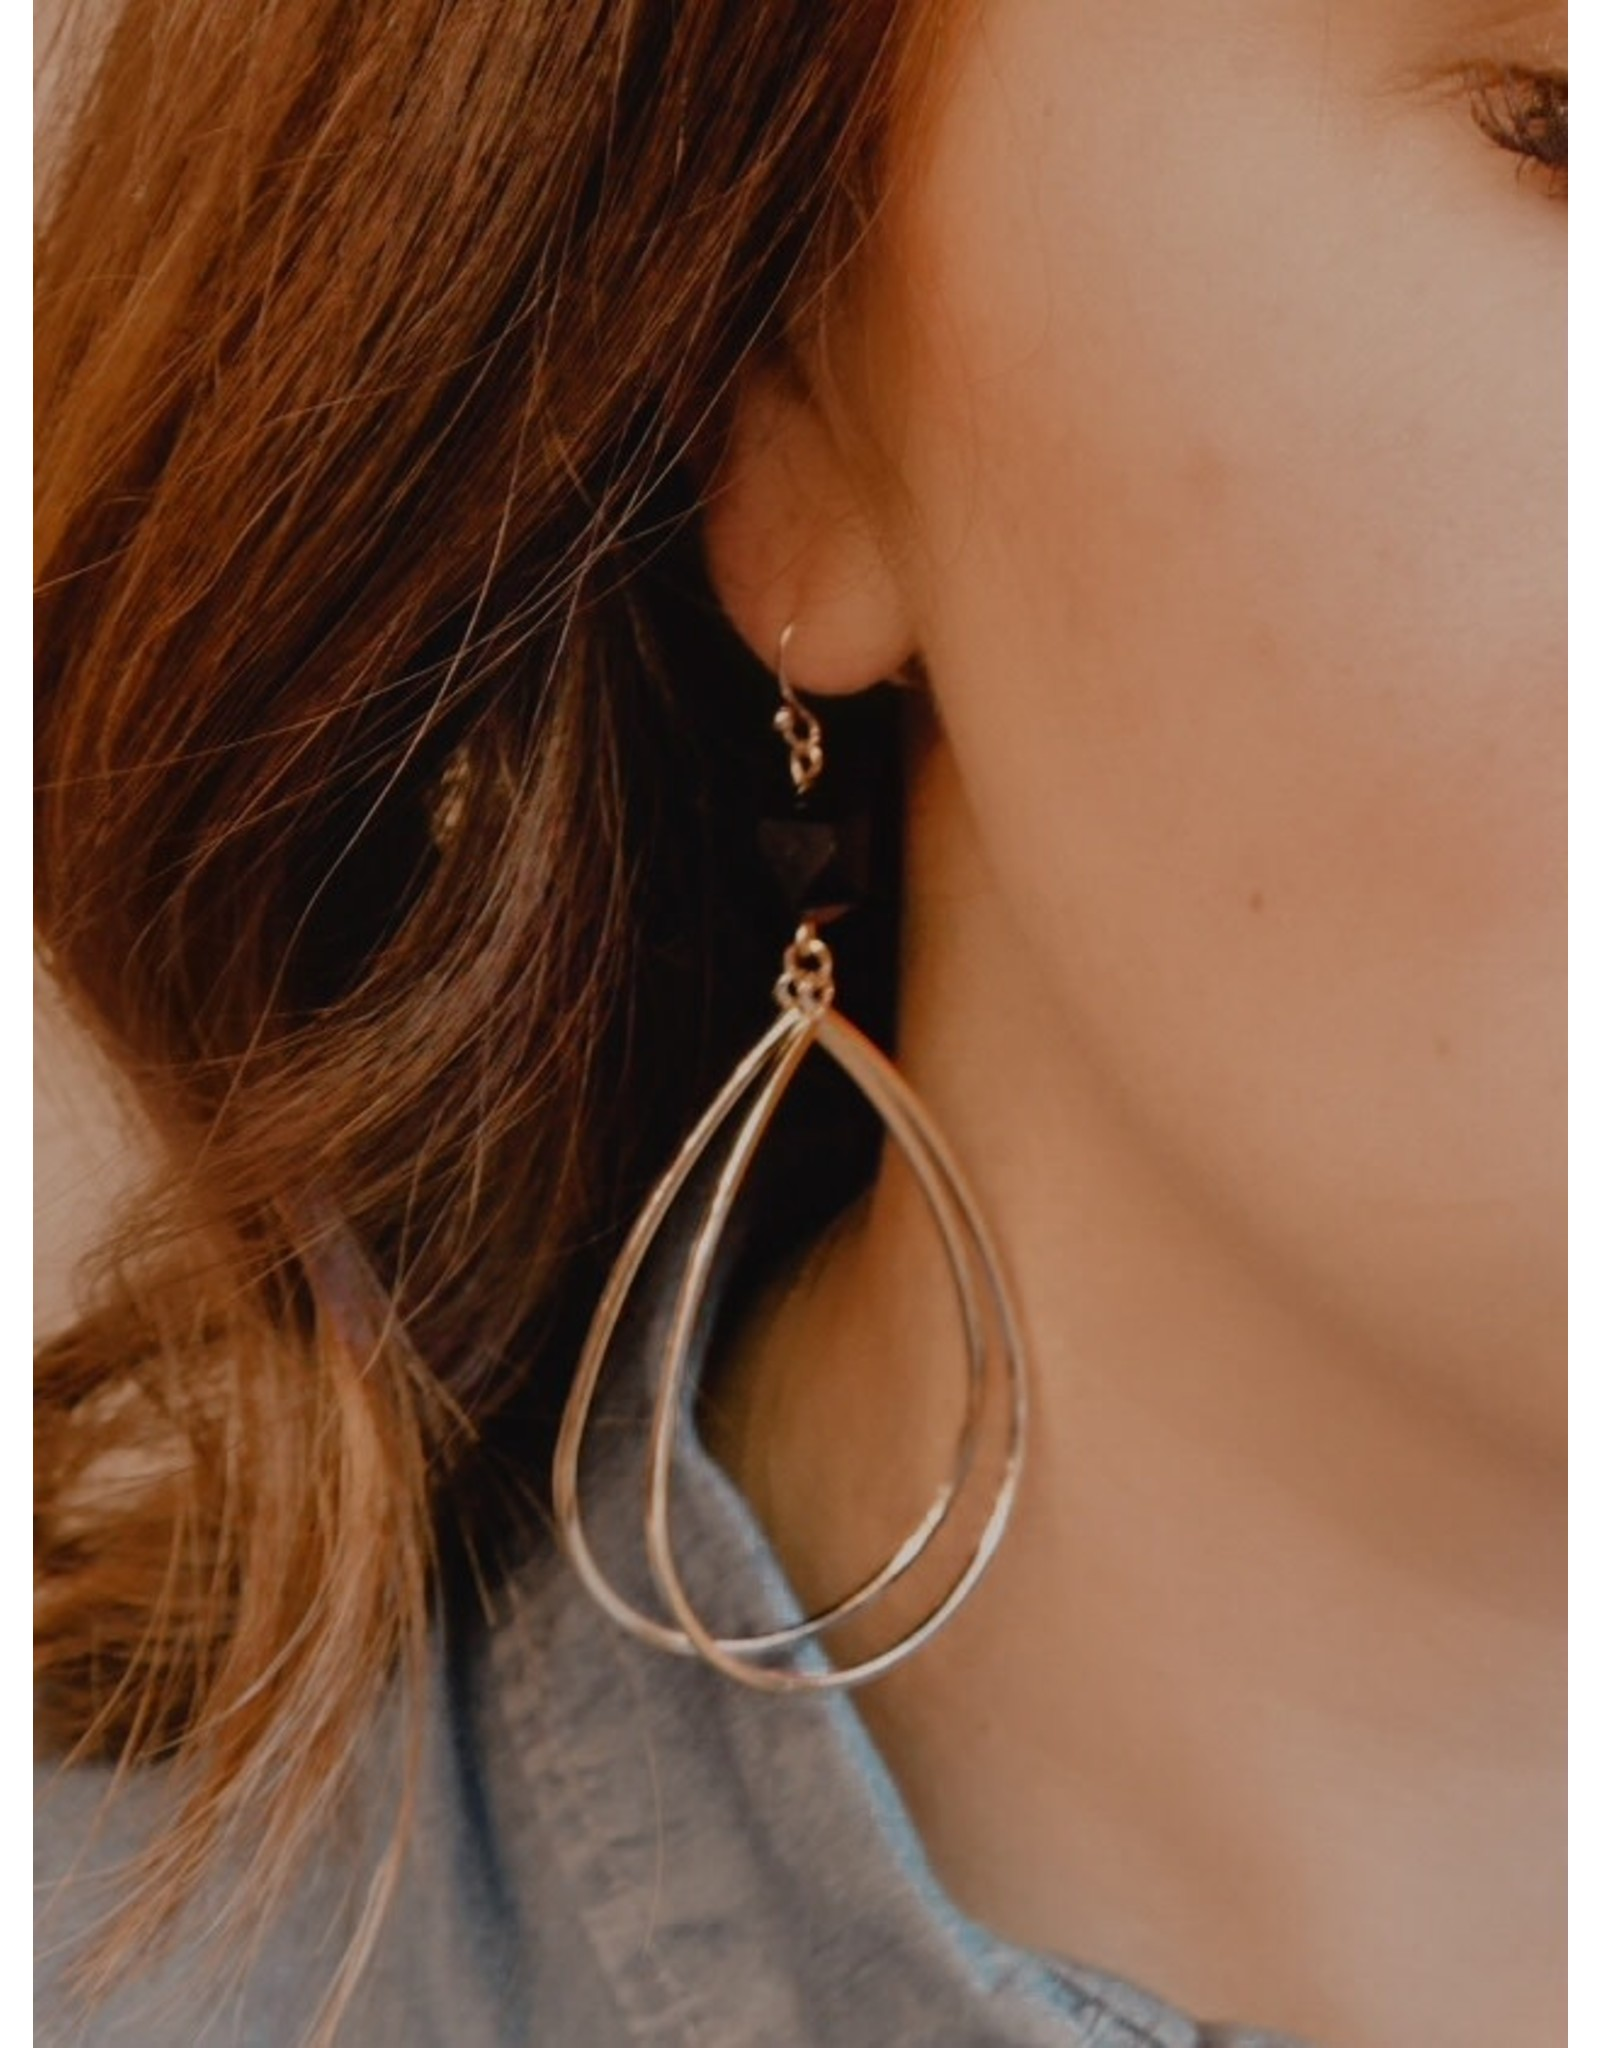 COAL Black Stone Gold Dangle Earring